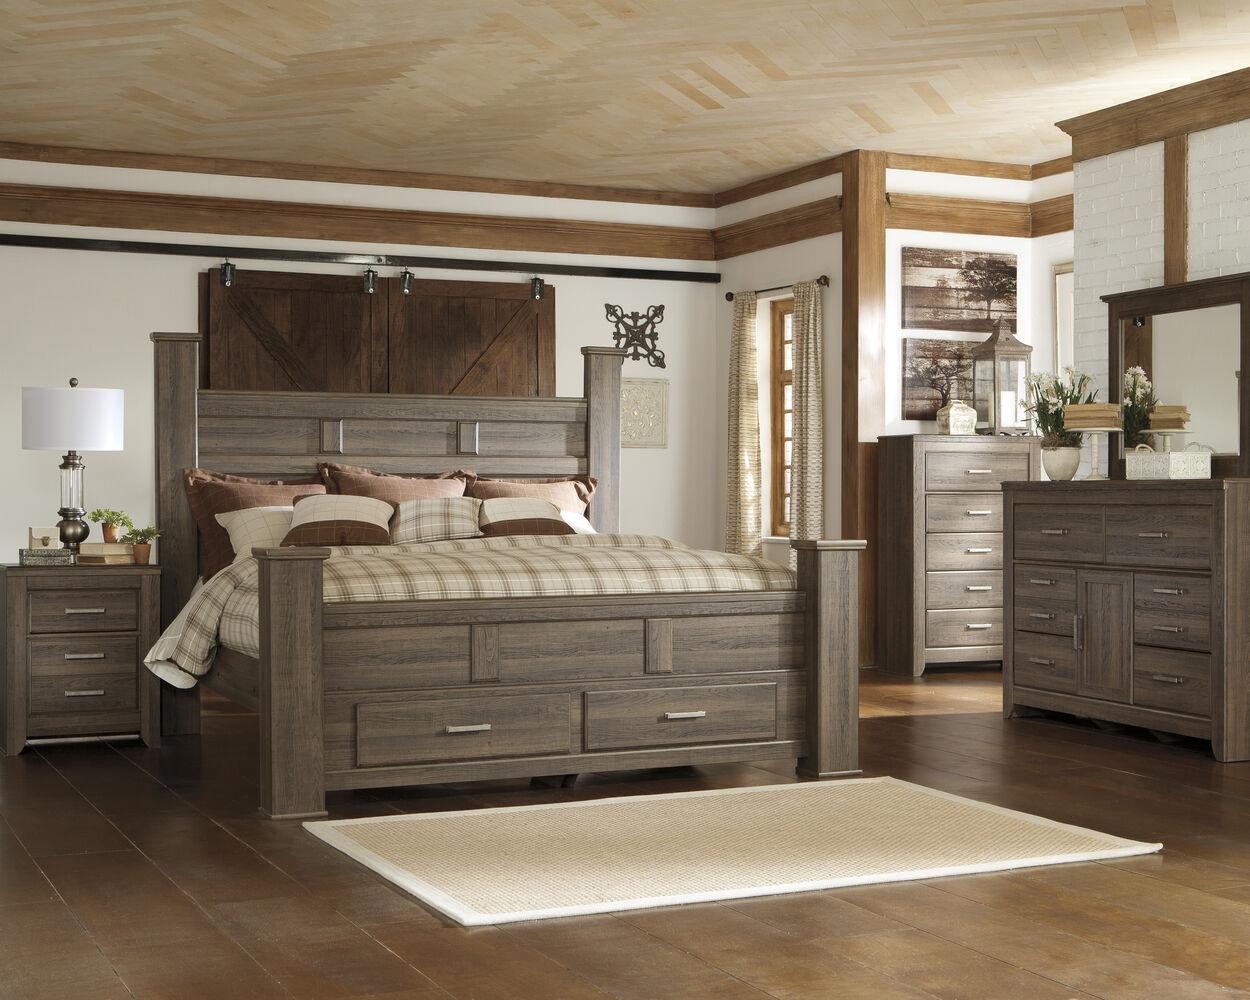 Ashley Juararo Storage Bed Mathis Brothers Furniture